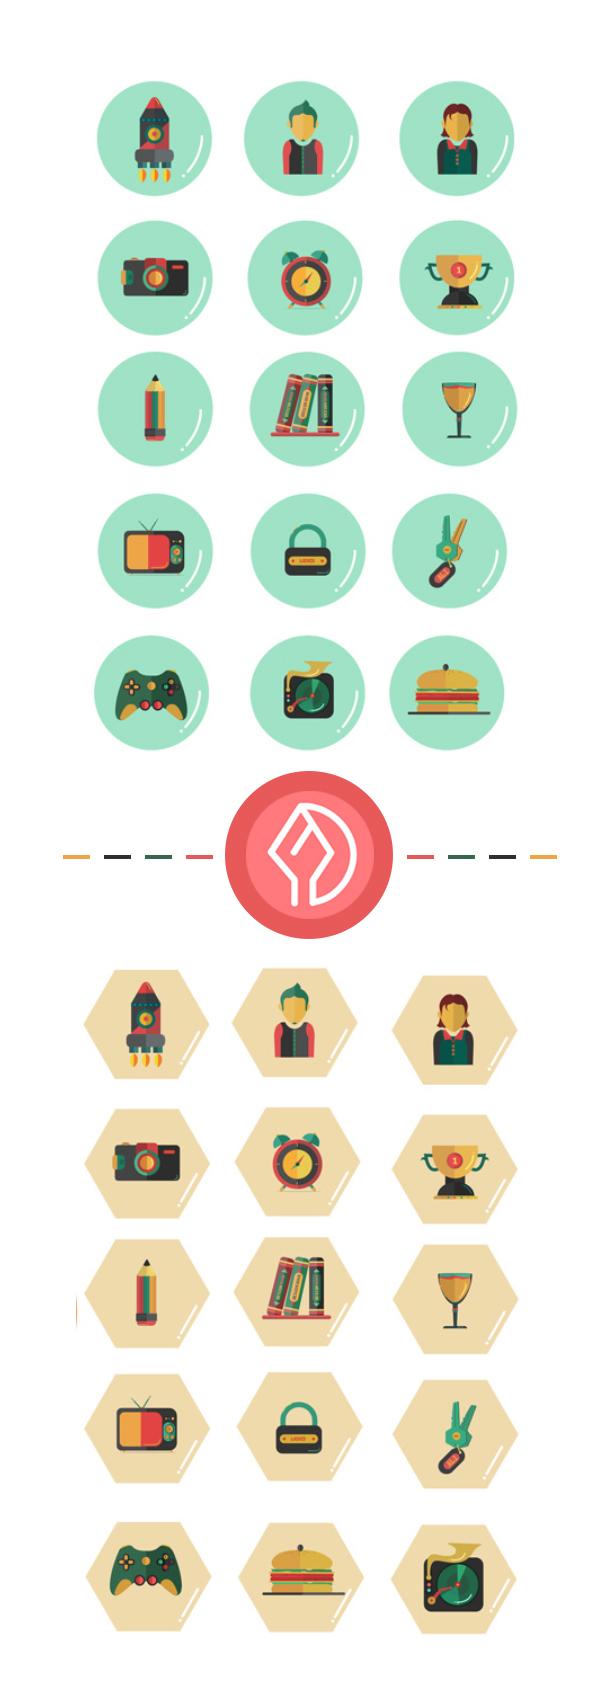 icons flat Flaticons free downlaod free flat icons alisabry ali sabry design ai EPS Illustrator ALISABRYICONS ALI`SICON